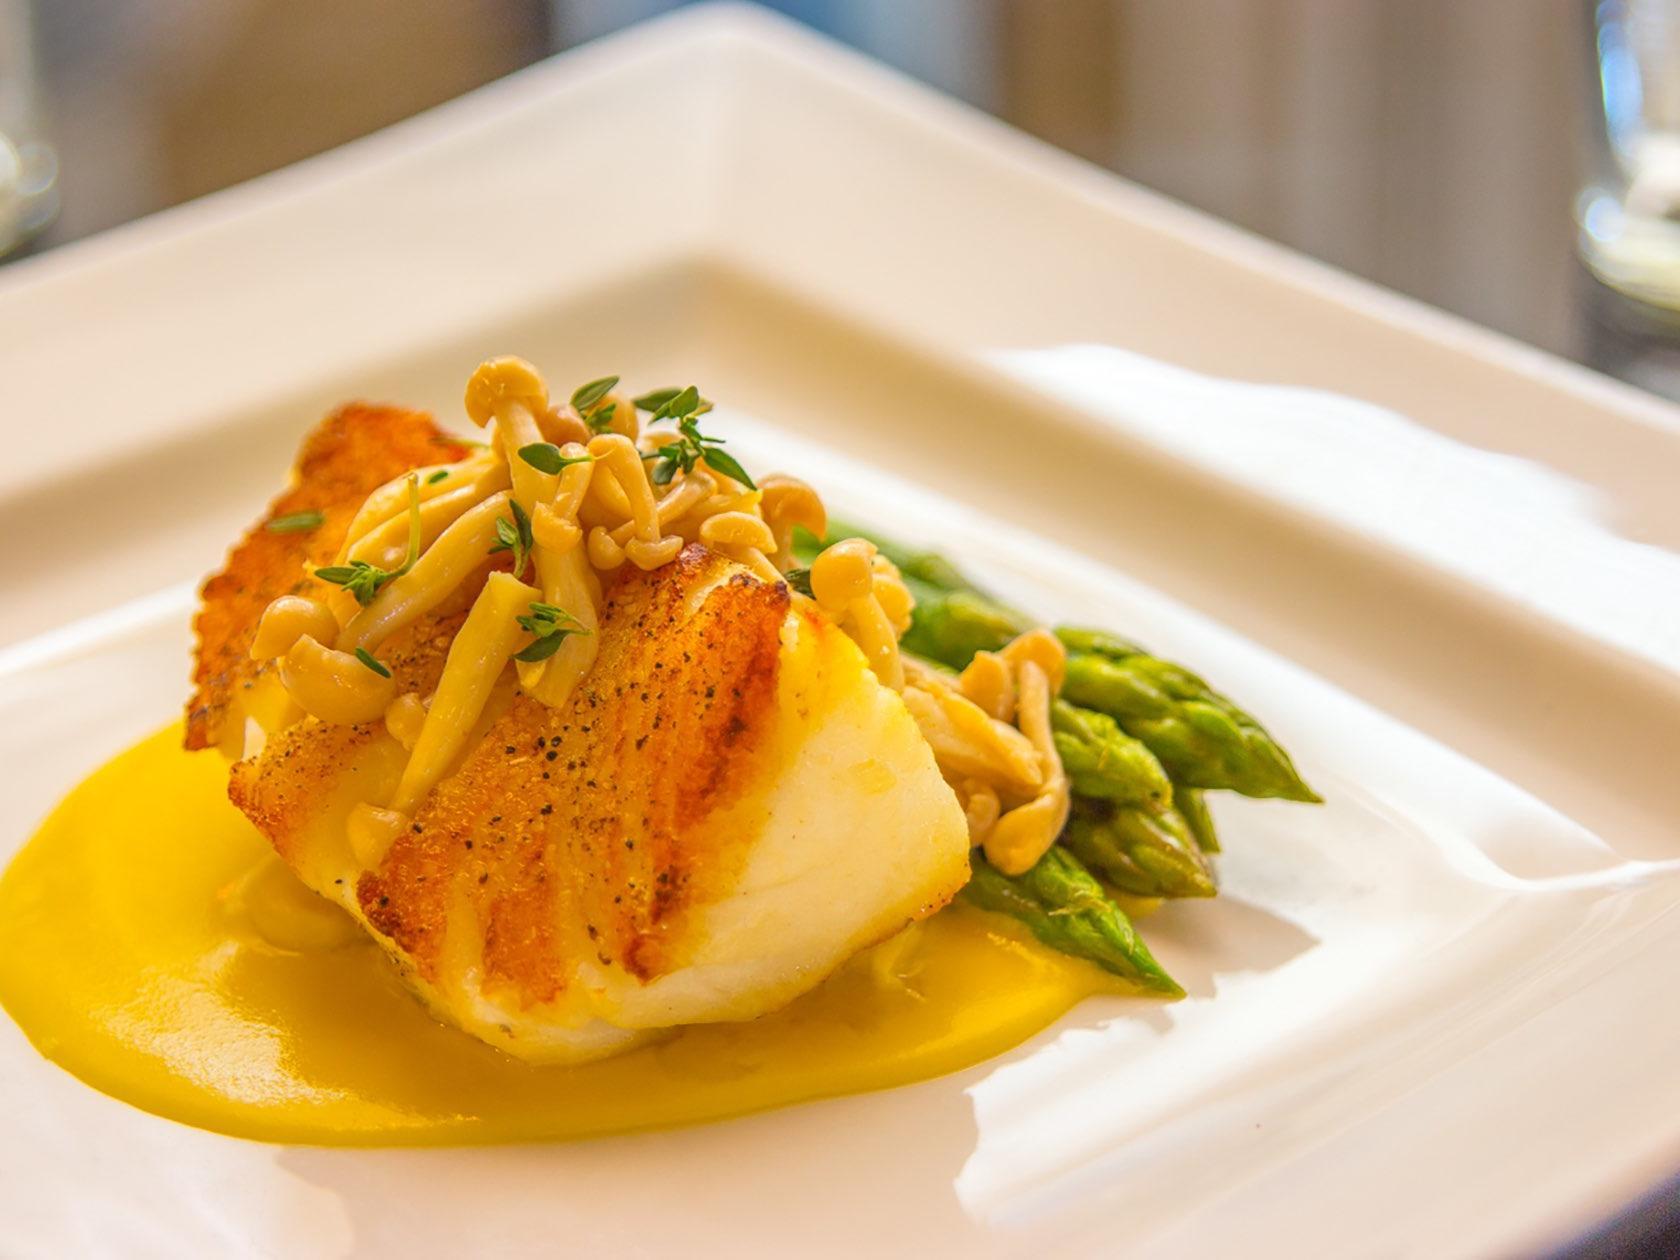 Fish Dish at The Landmark Restaurant